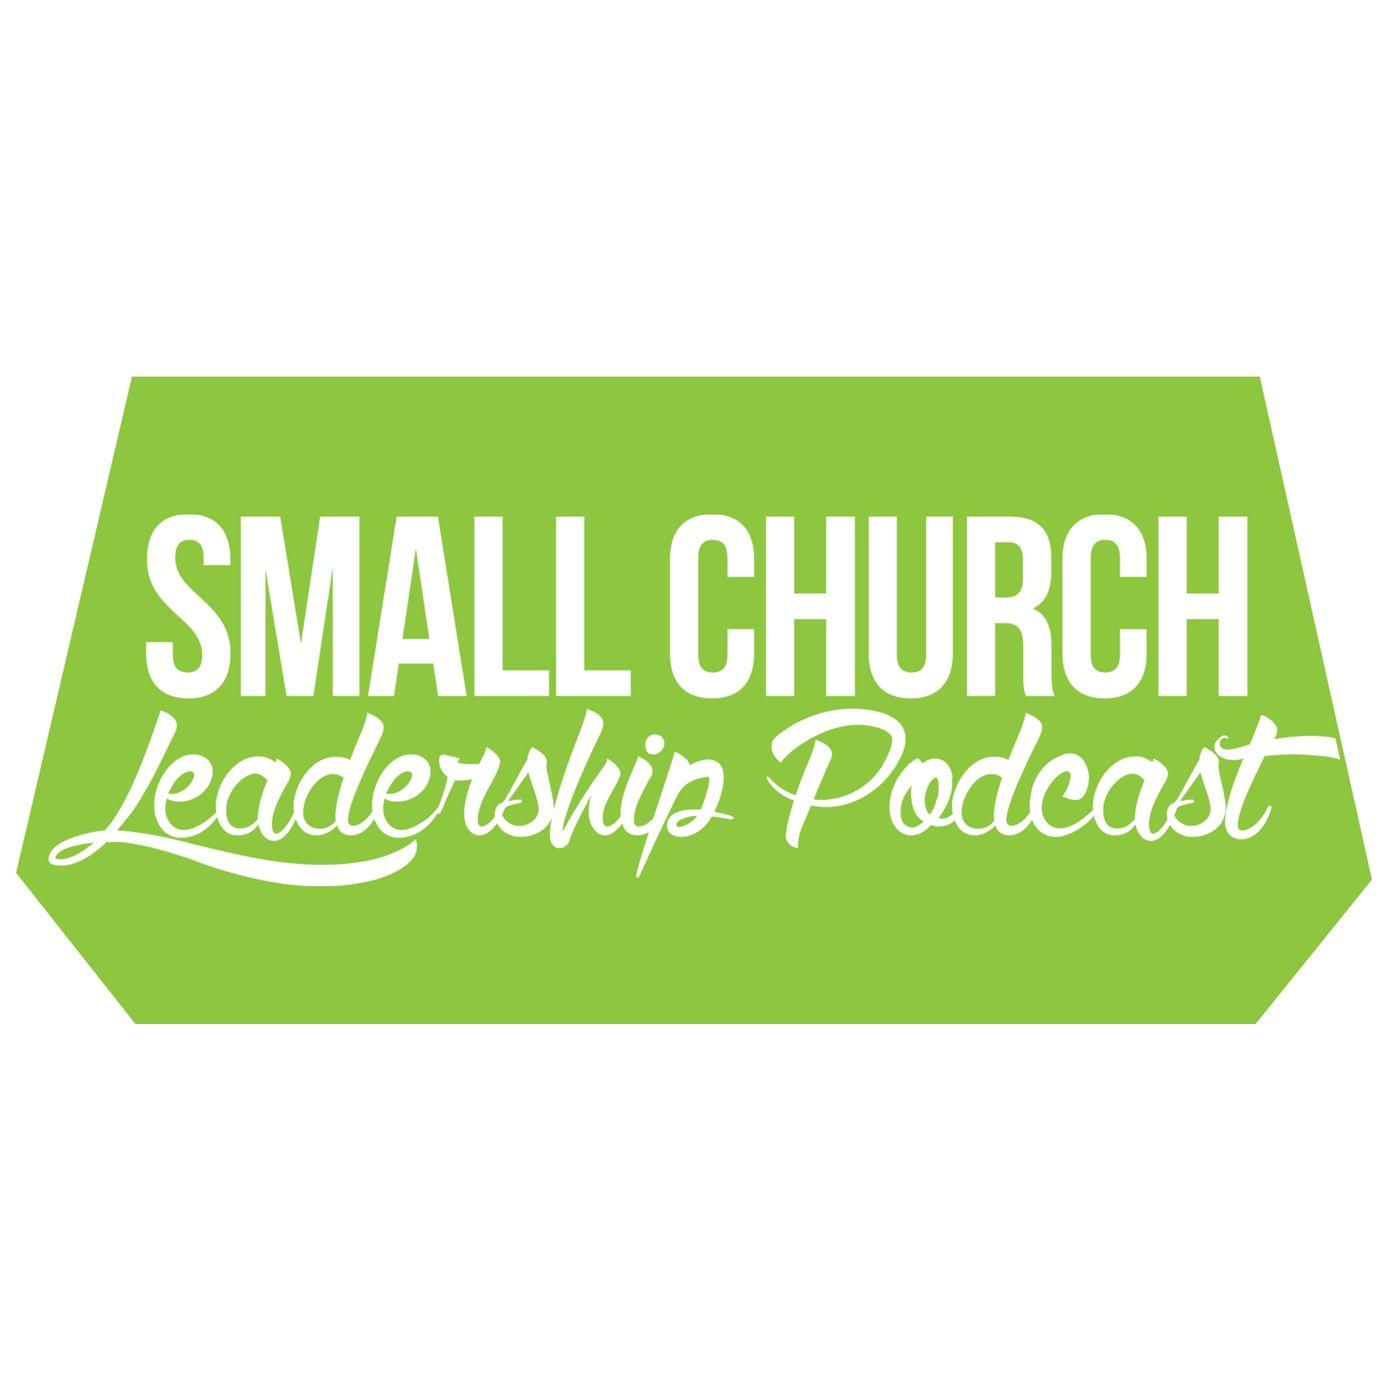 Small Church Leadership Podcast